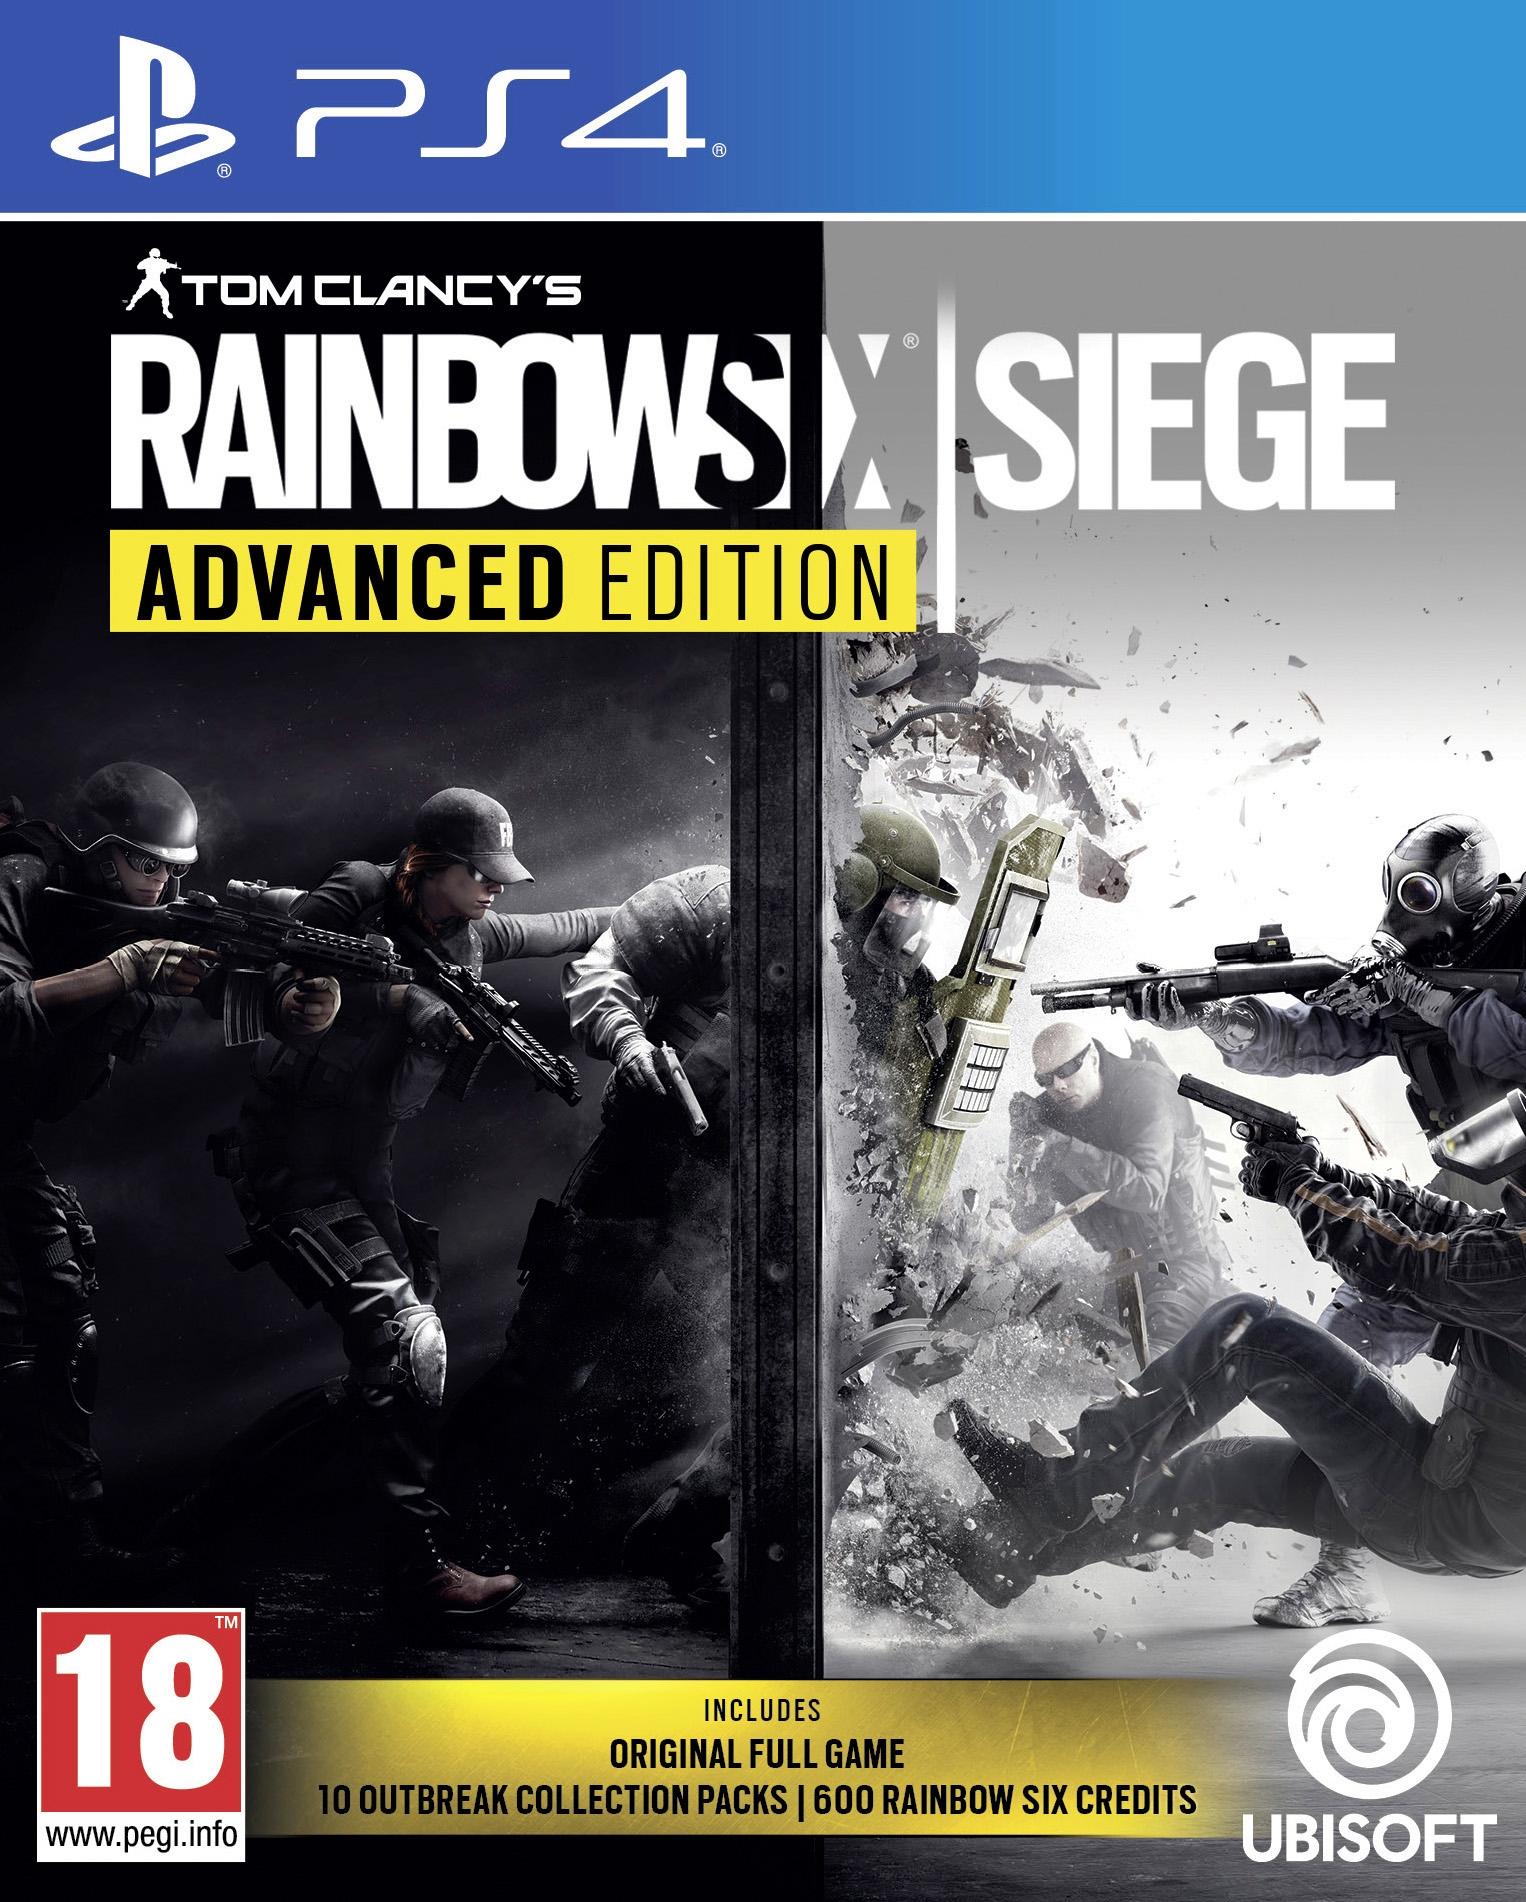 PS4 Rainbow Six Siege Advanced Edition